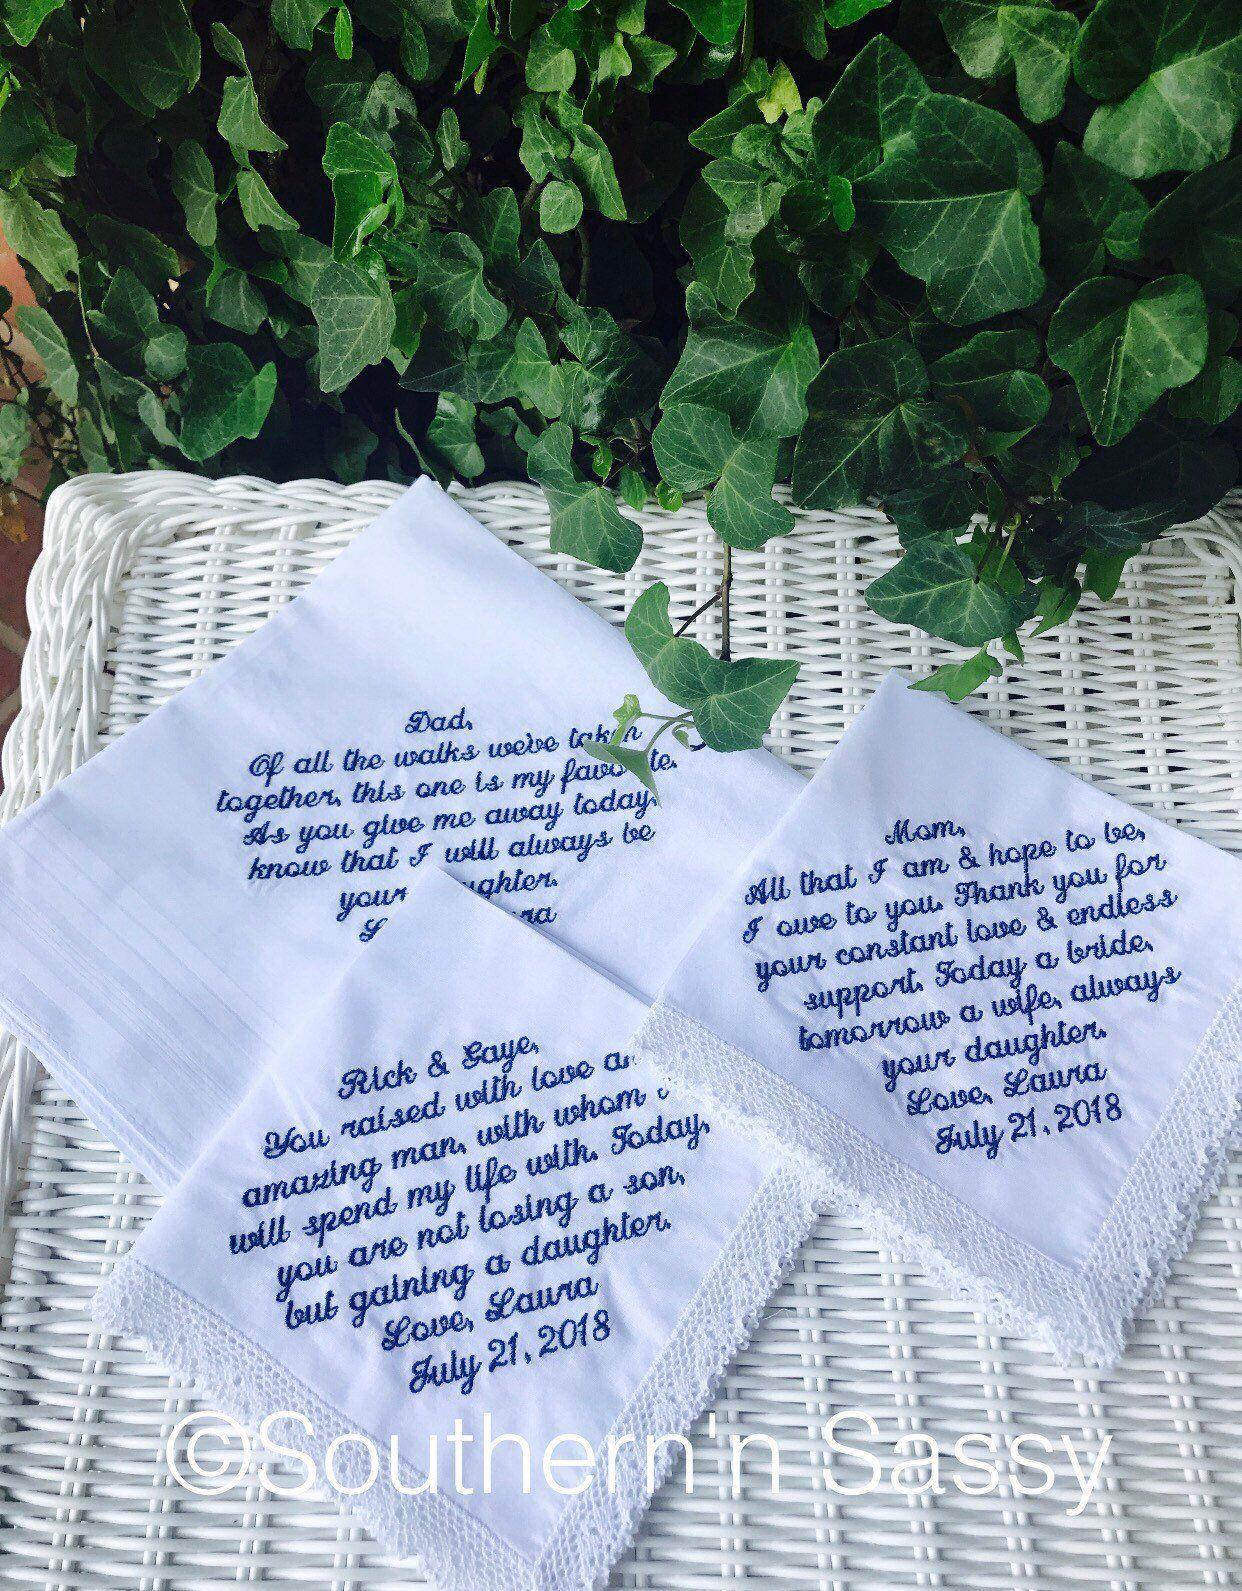 Custom Embroidery Wedding Handkerchief, Bride's Words On Hankies